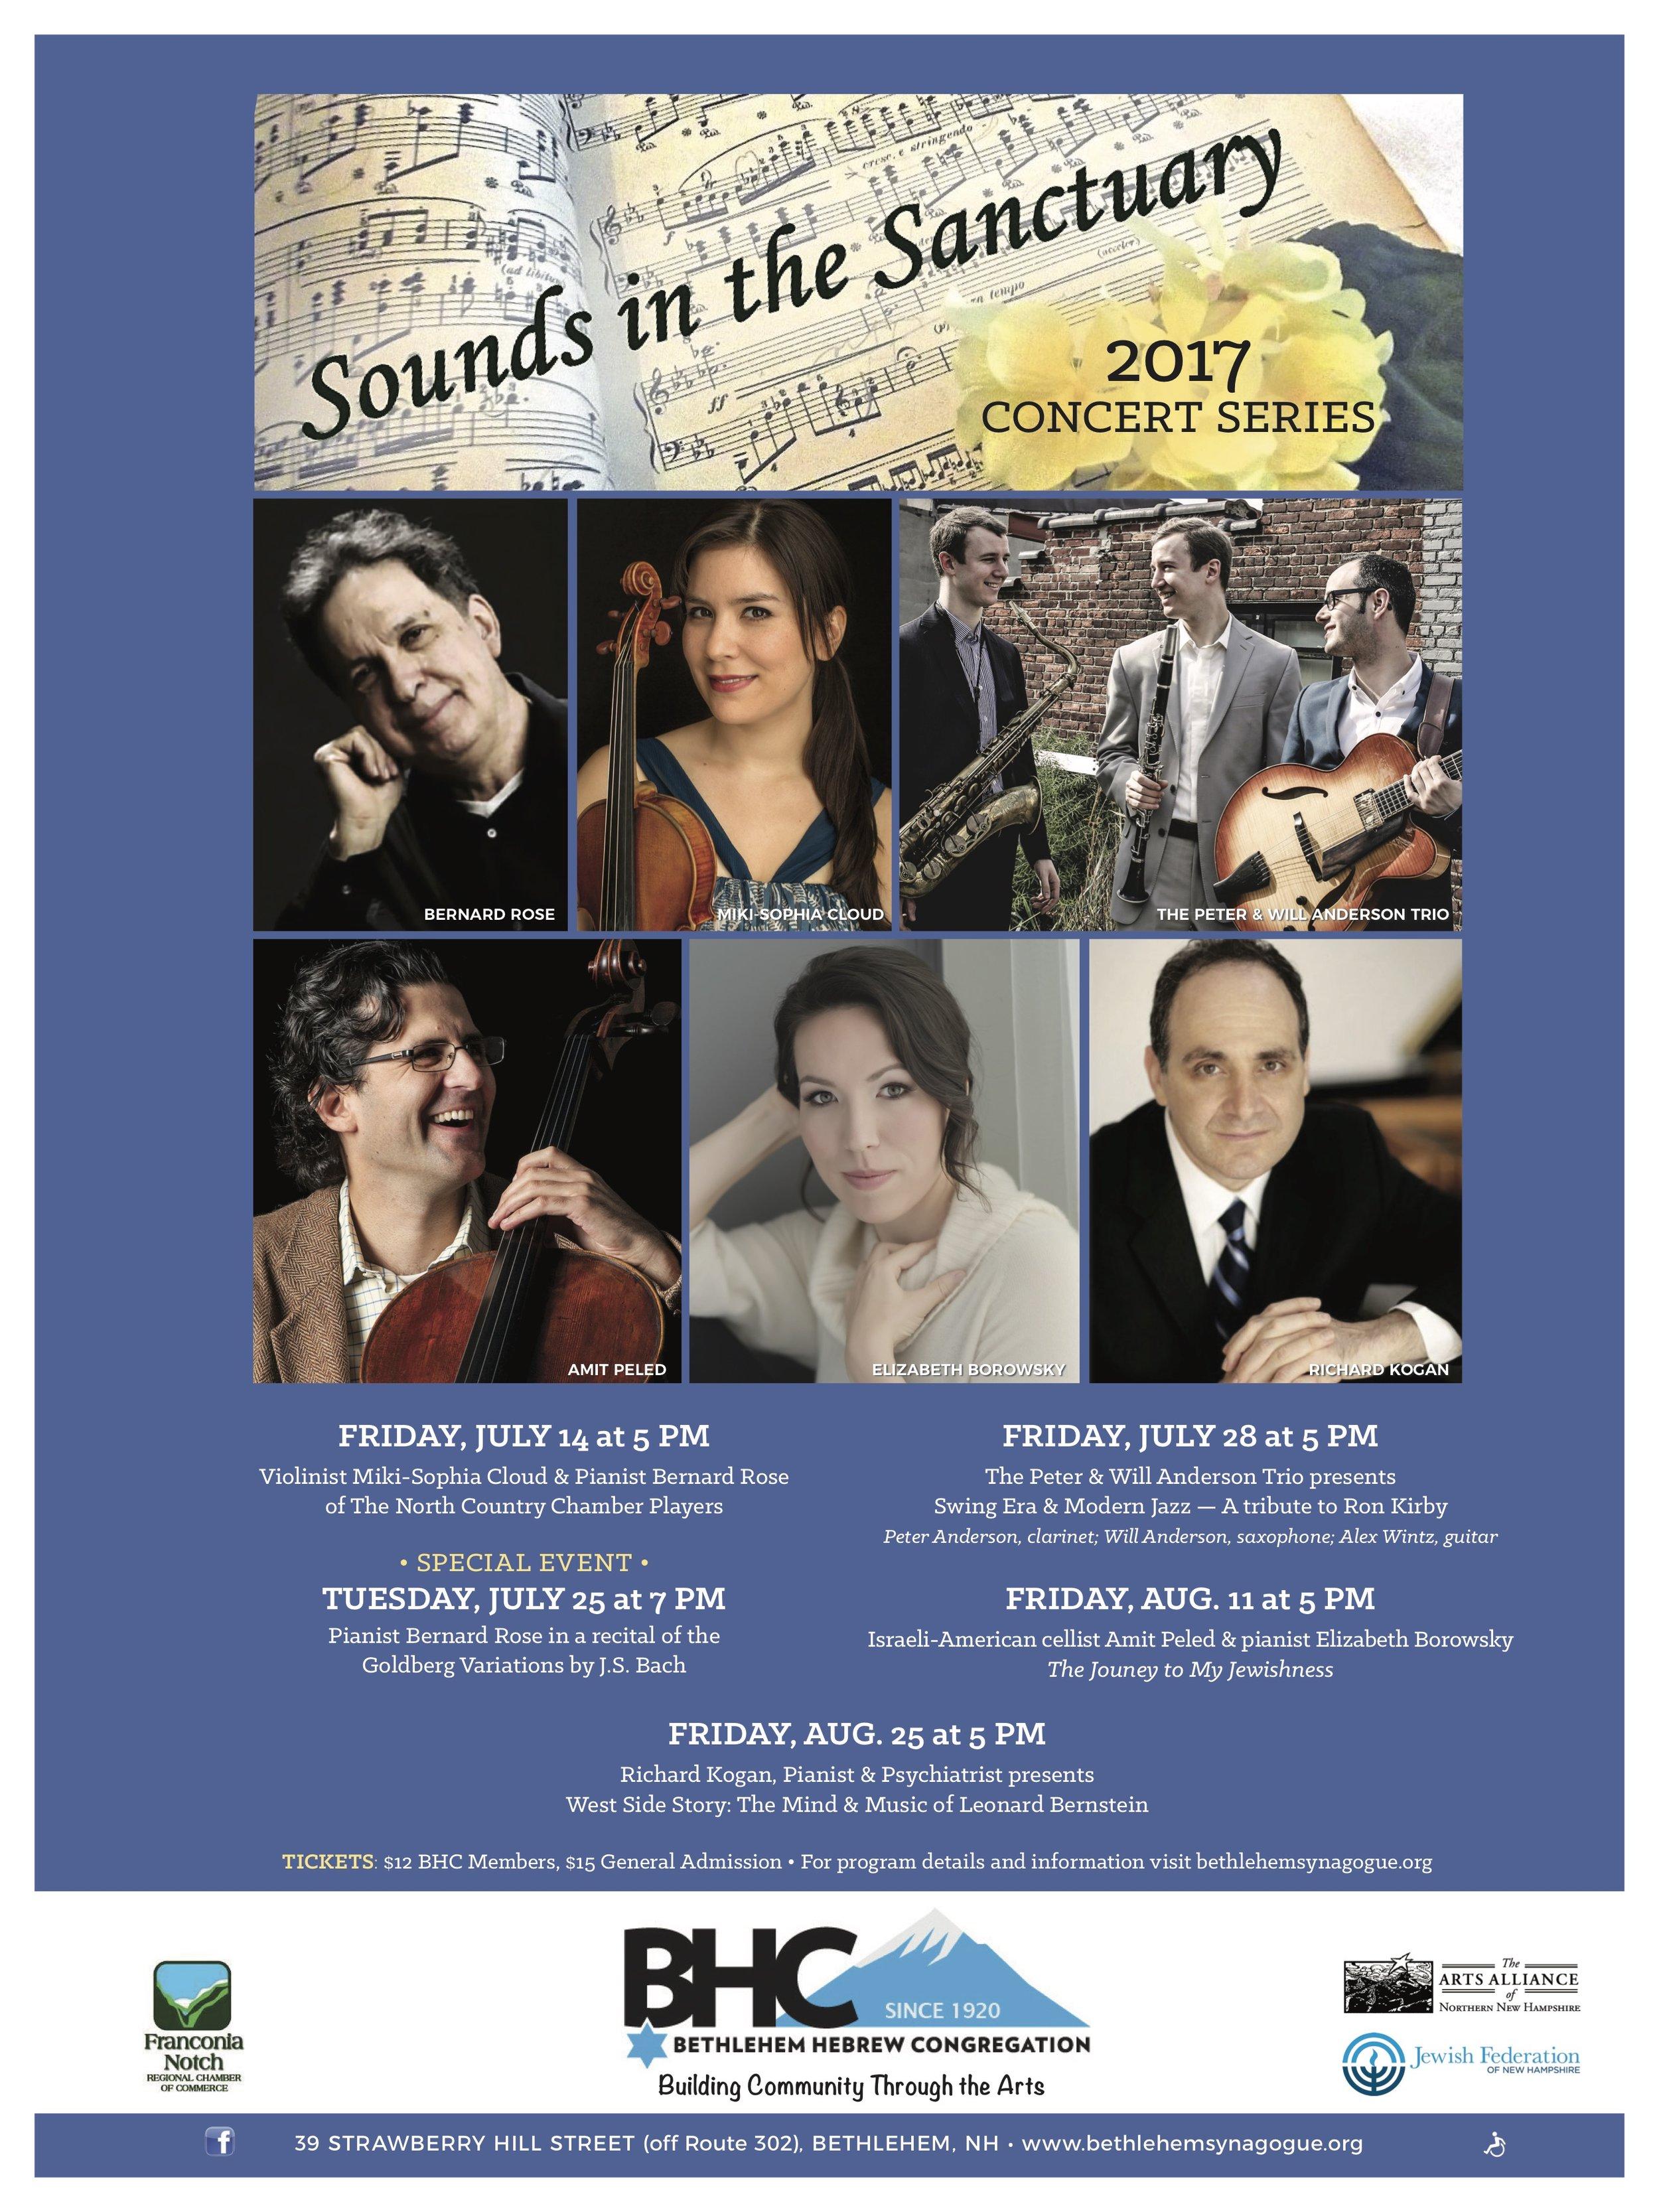 BHC Sounds of Sanct. Poster_2017_v.4.jpg